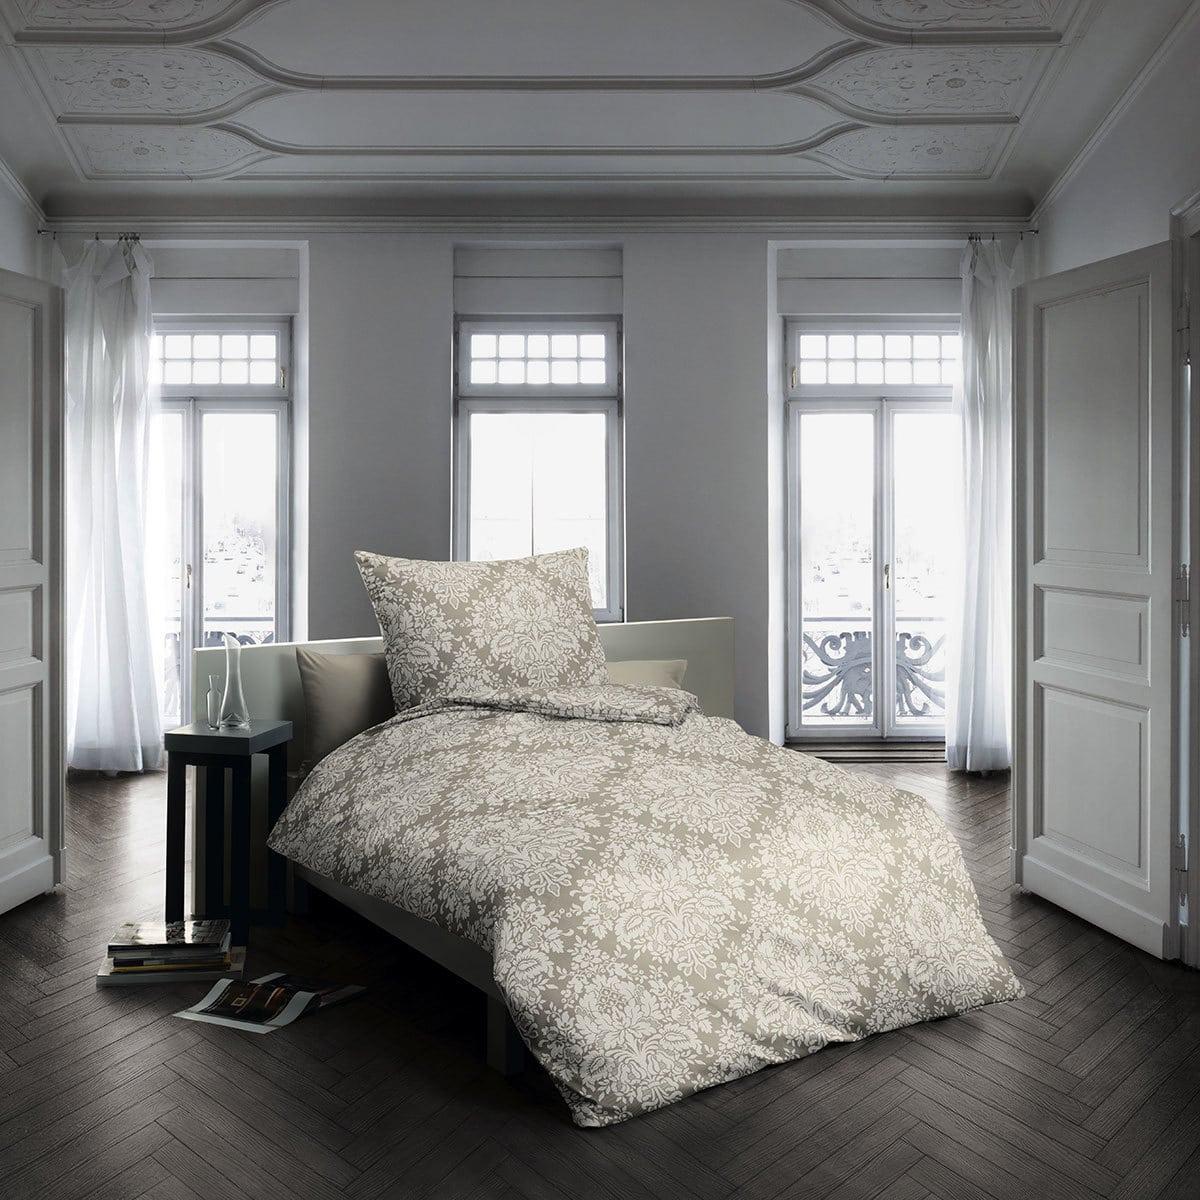 fleuresse edelflanell bettw sche ornamente mandel g nstig online kaufen bei bettwaren shop. Black Bedroom Furniture Sets. Home Design Ideas